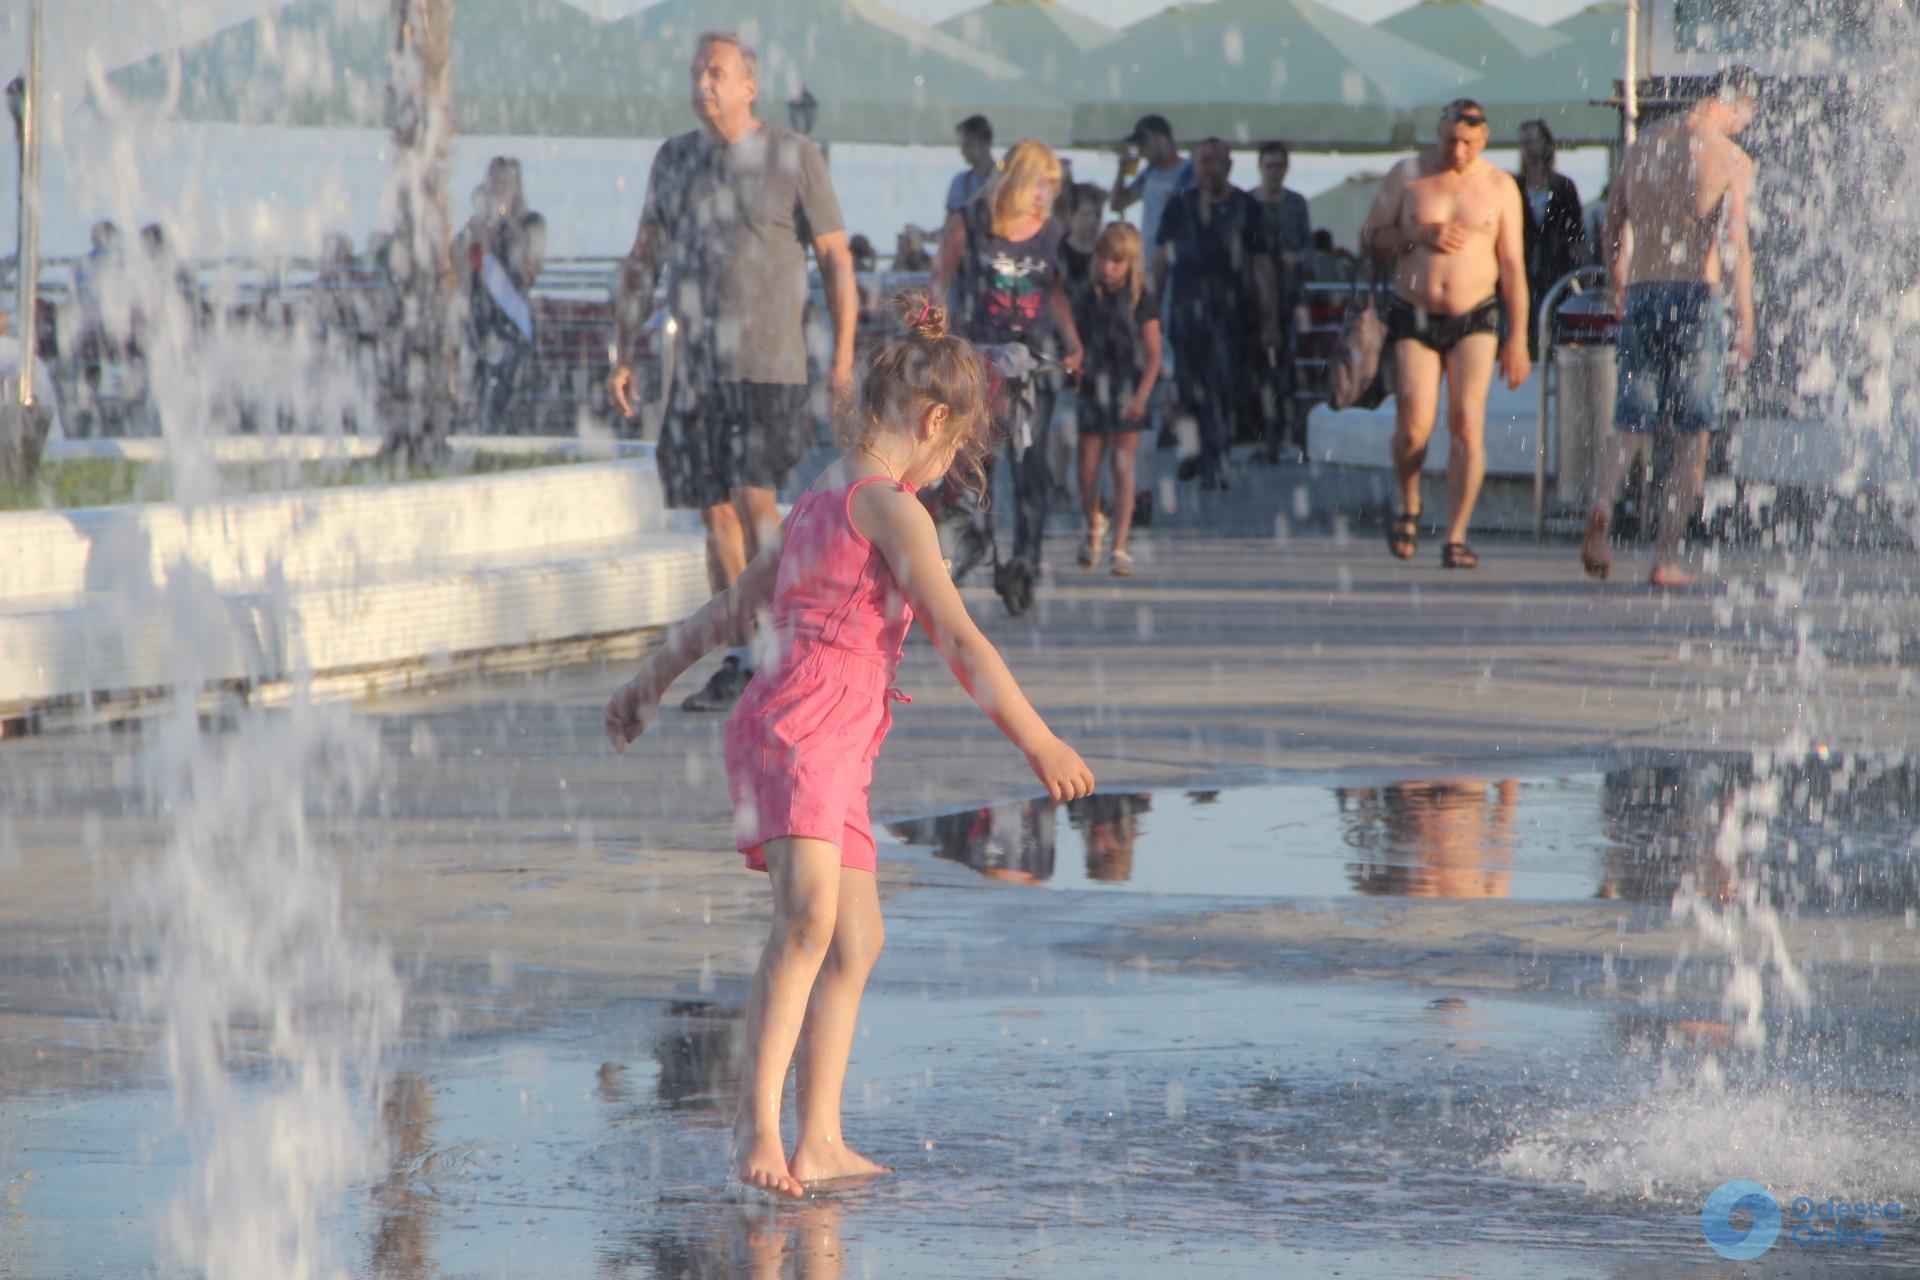 Вечер на Ланжероне: пляжники, романтики и ребятня в фонтанах (фоторепортаж)